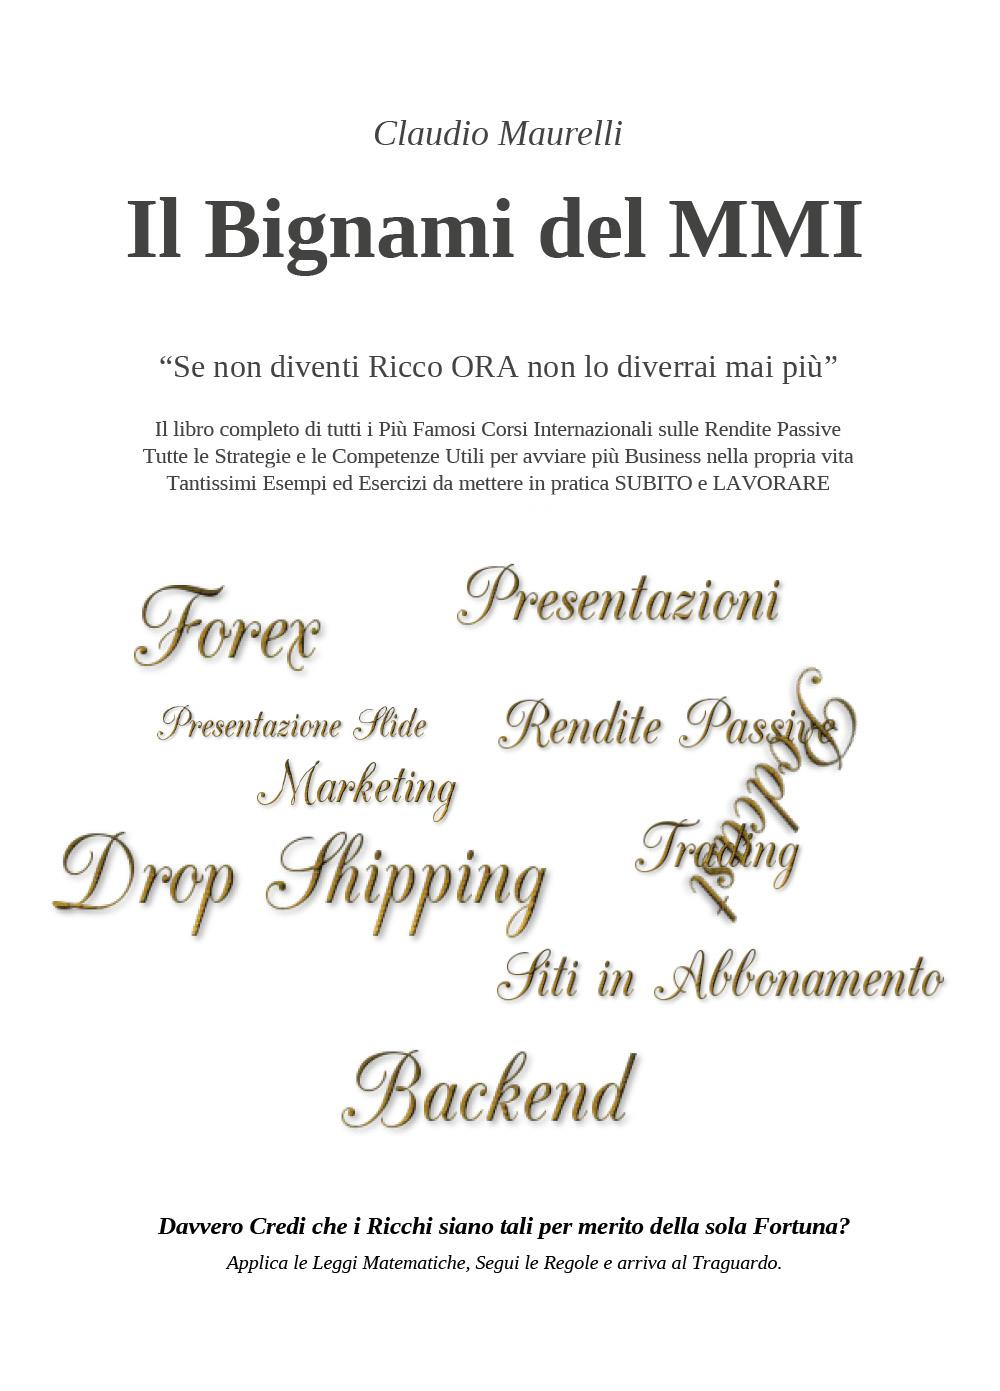 Il Bignami del MMI